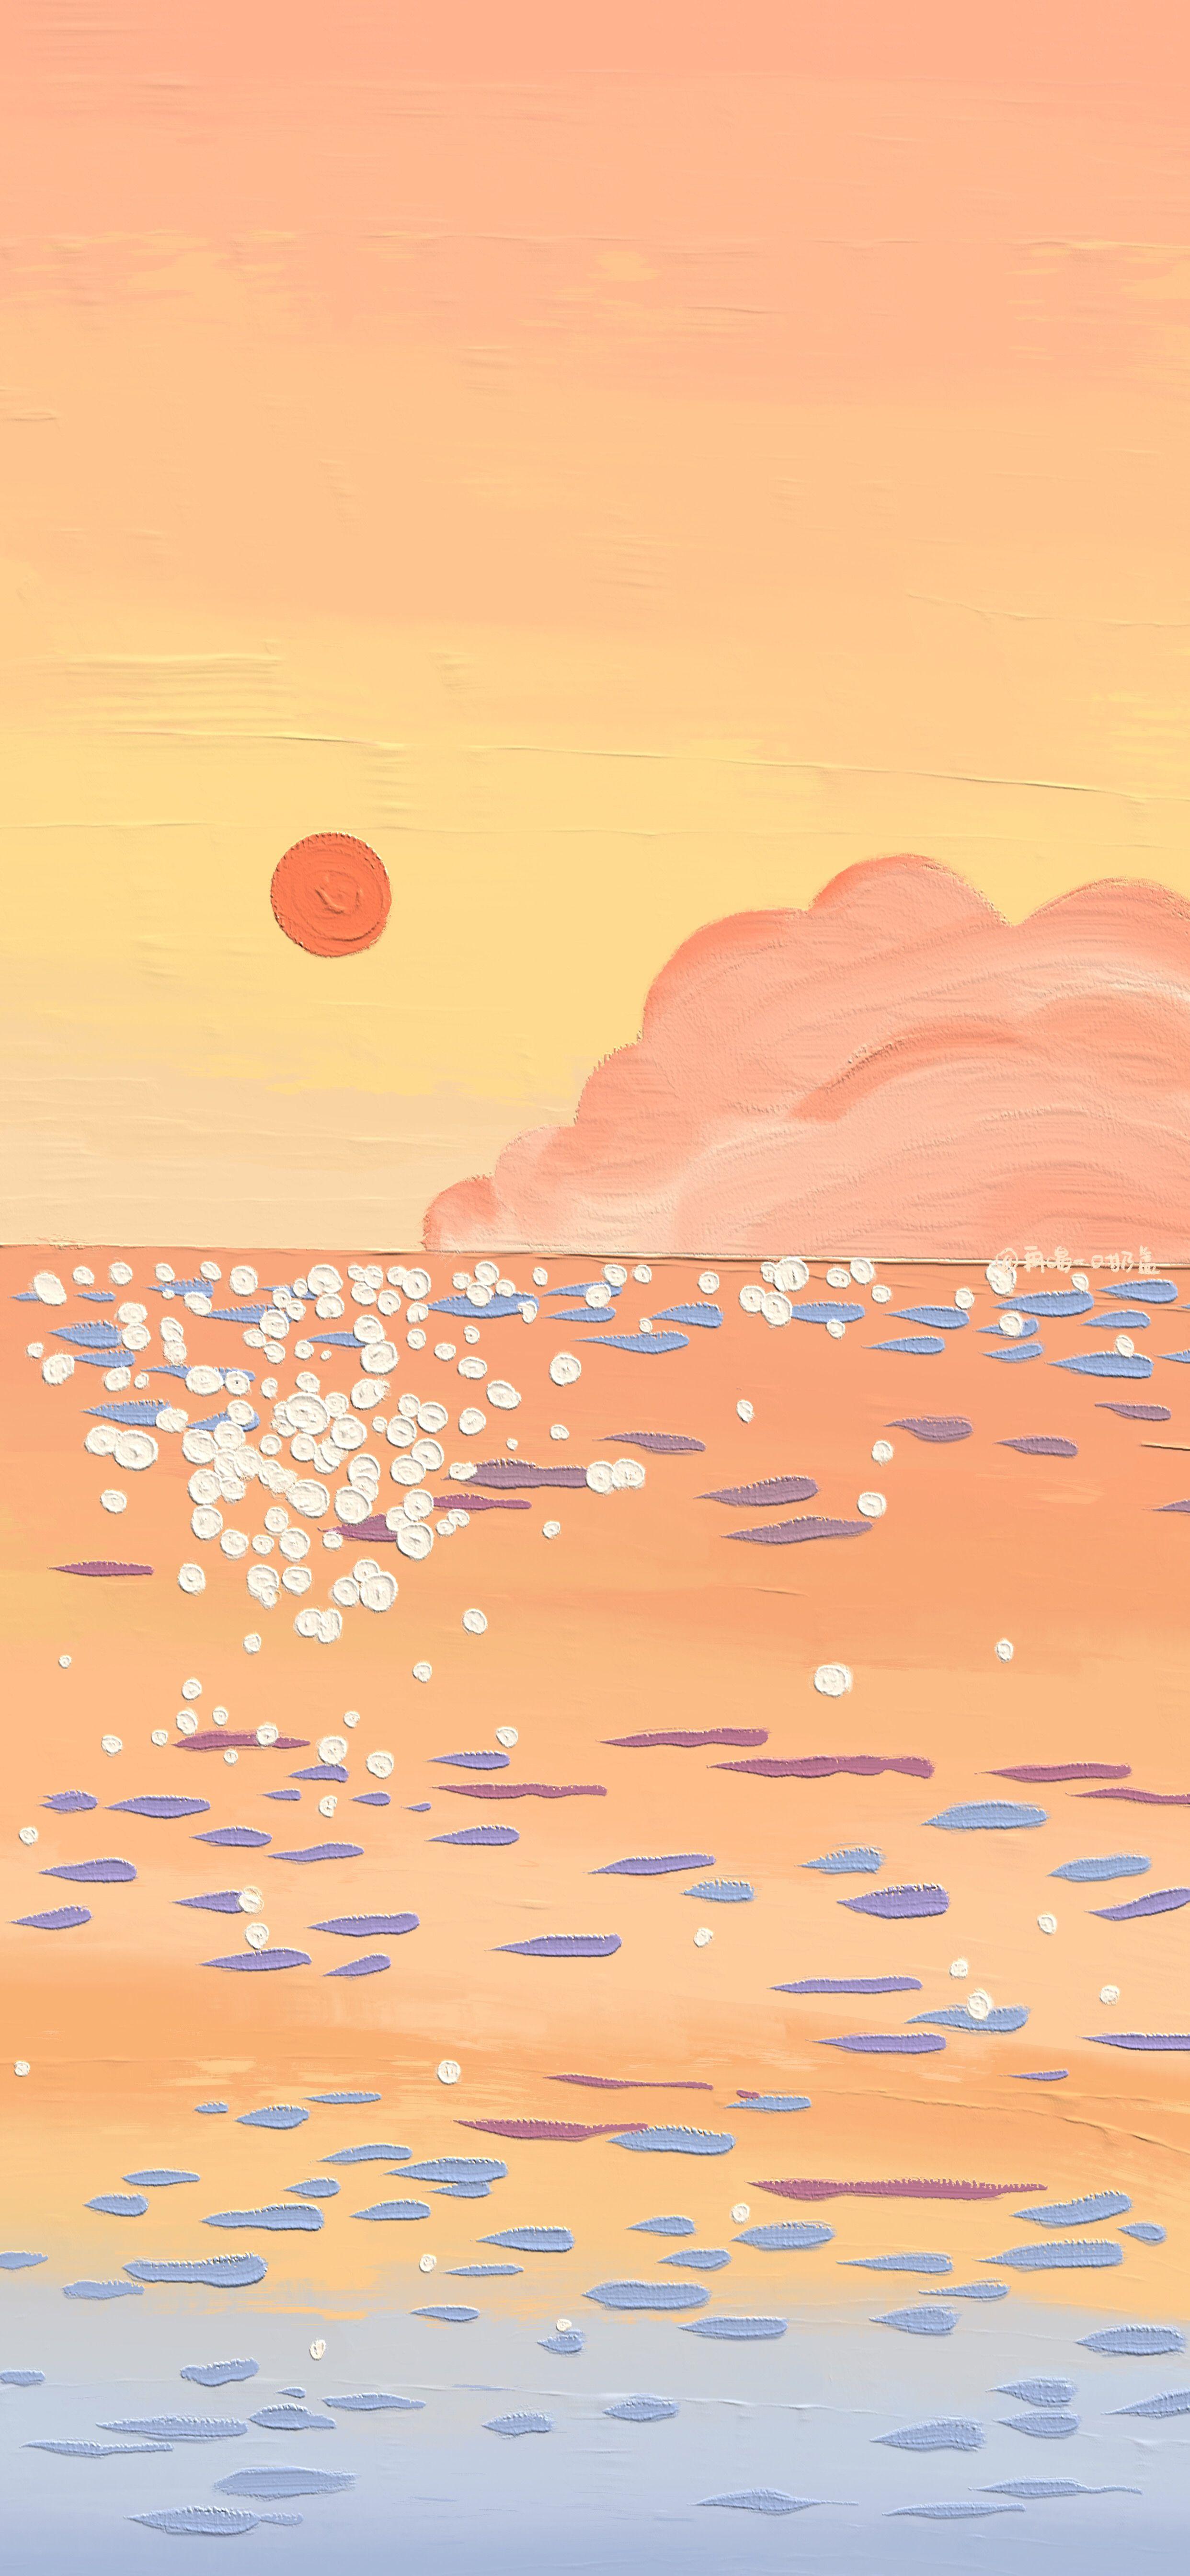 Pin Oleh Di Layout Abstrak Lukisan Seni Seni Gif Aesthetic wallpaper gif phone